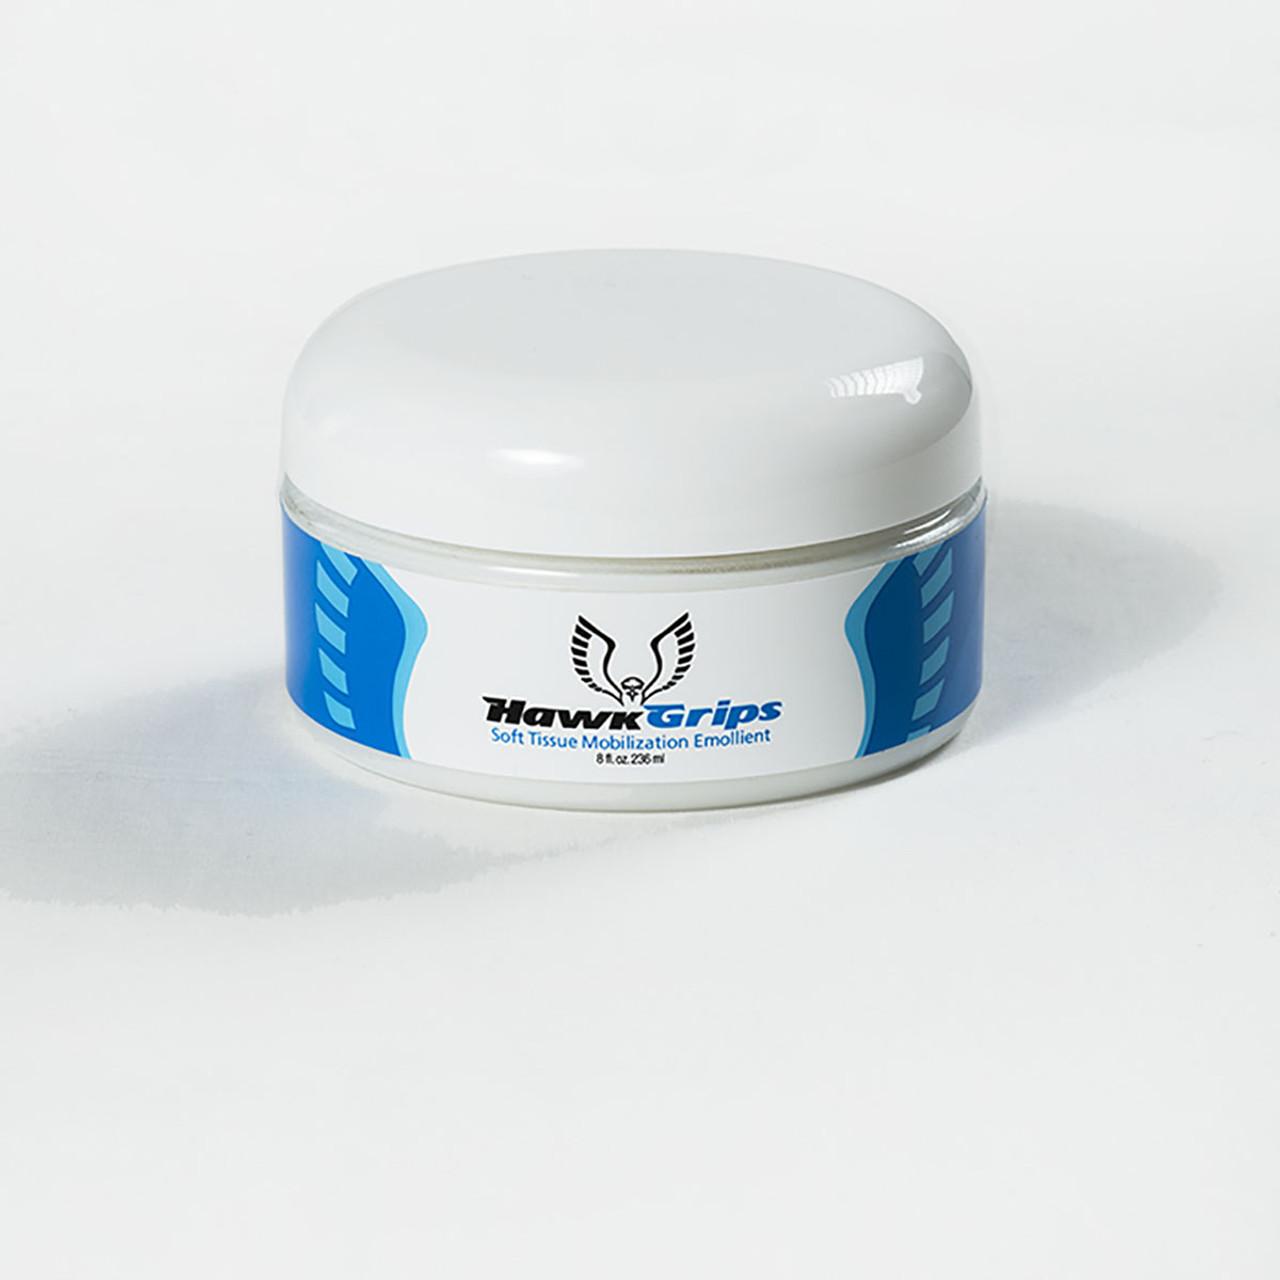 HawkGrips Fragrance Free Emollient, 10 jar pack